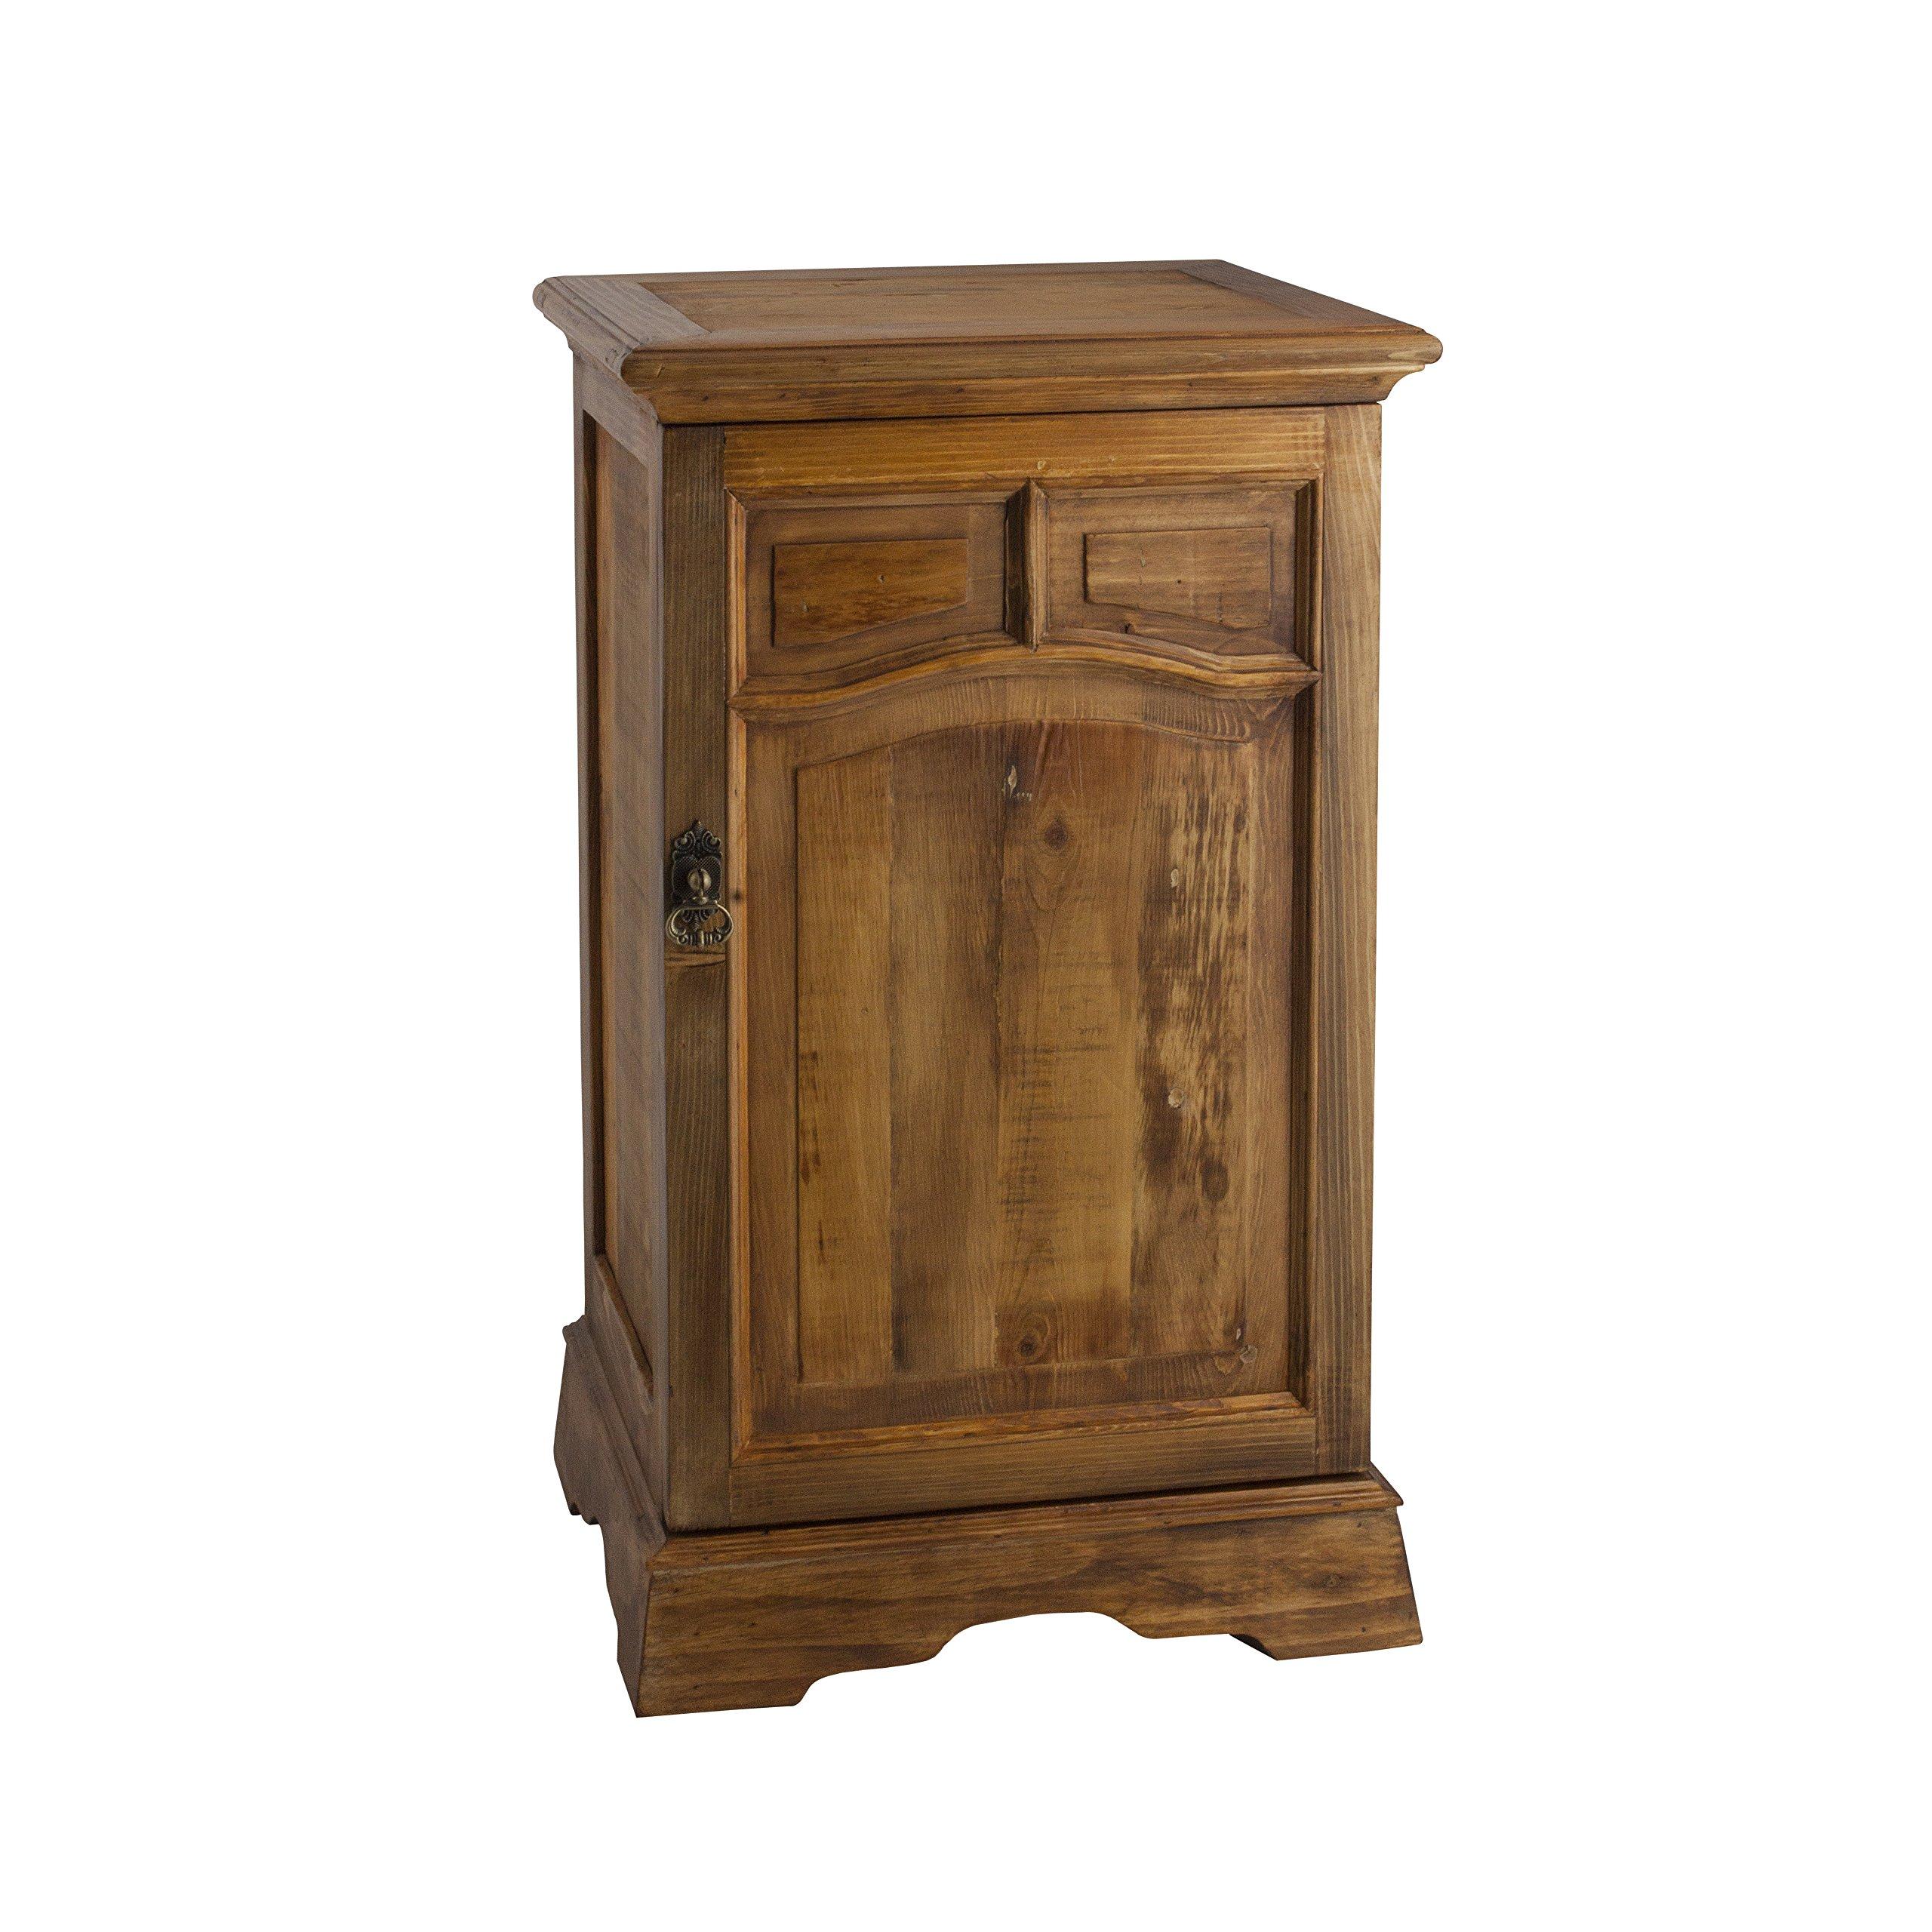 PL Home Wooden Base with Door